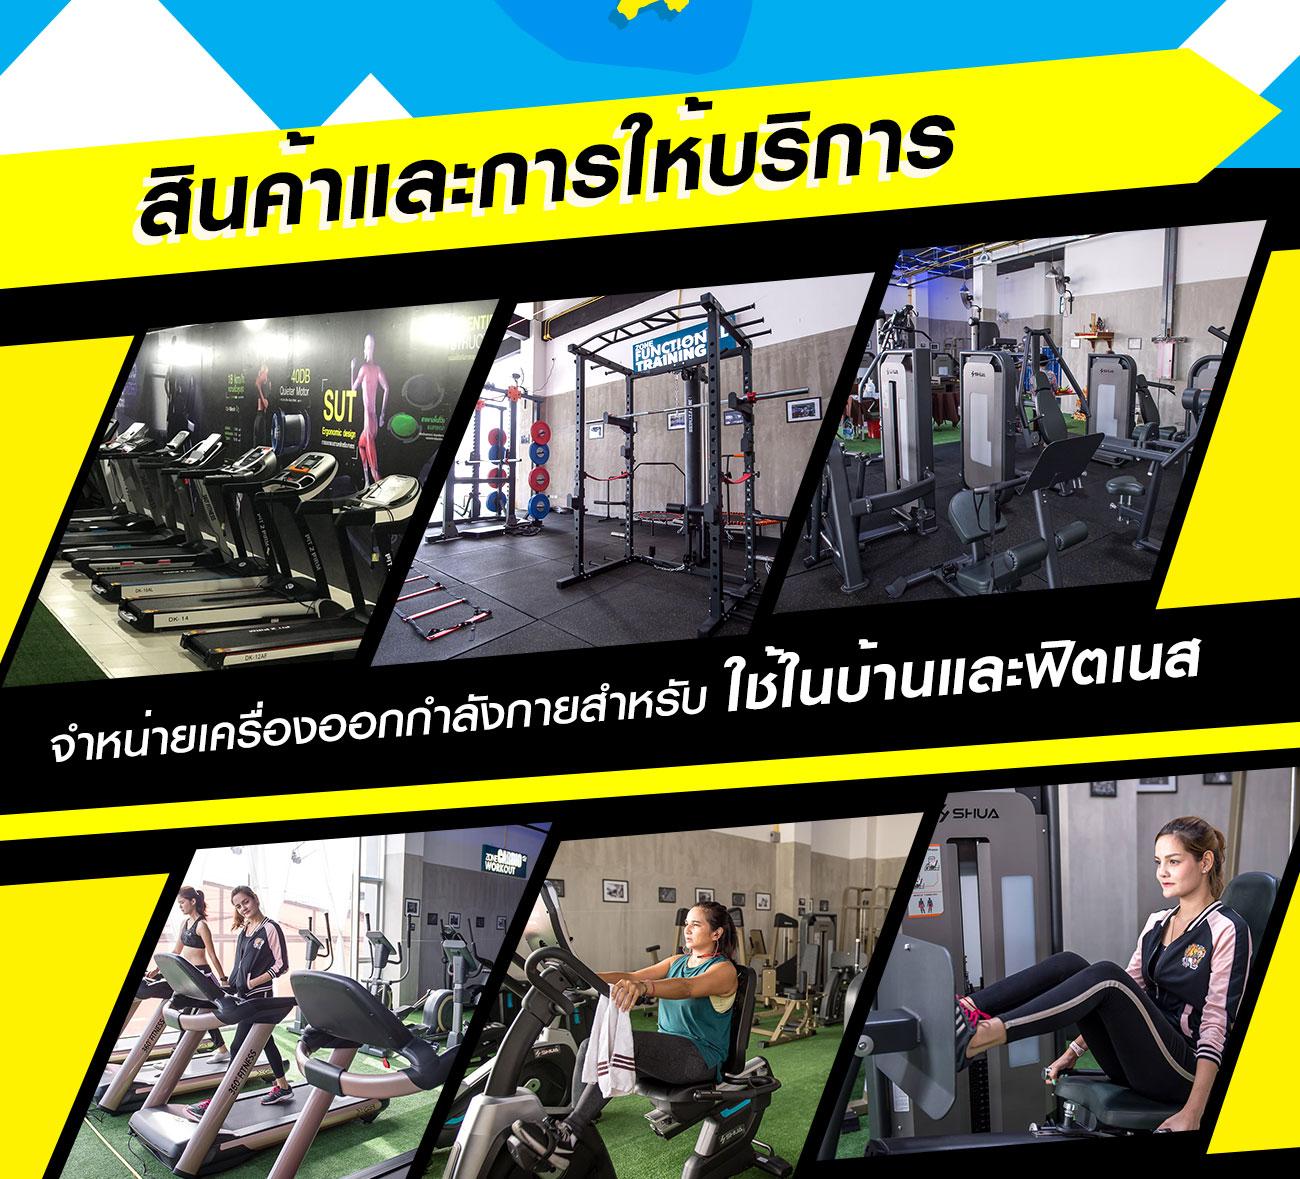 360 Ongsa Fitness Row